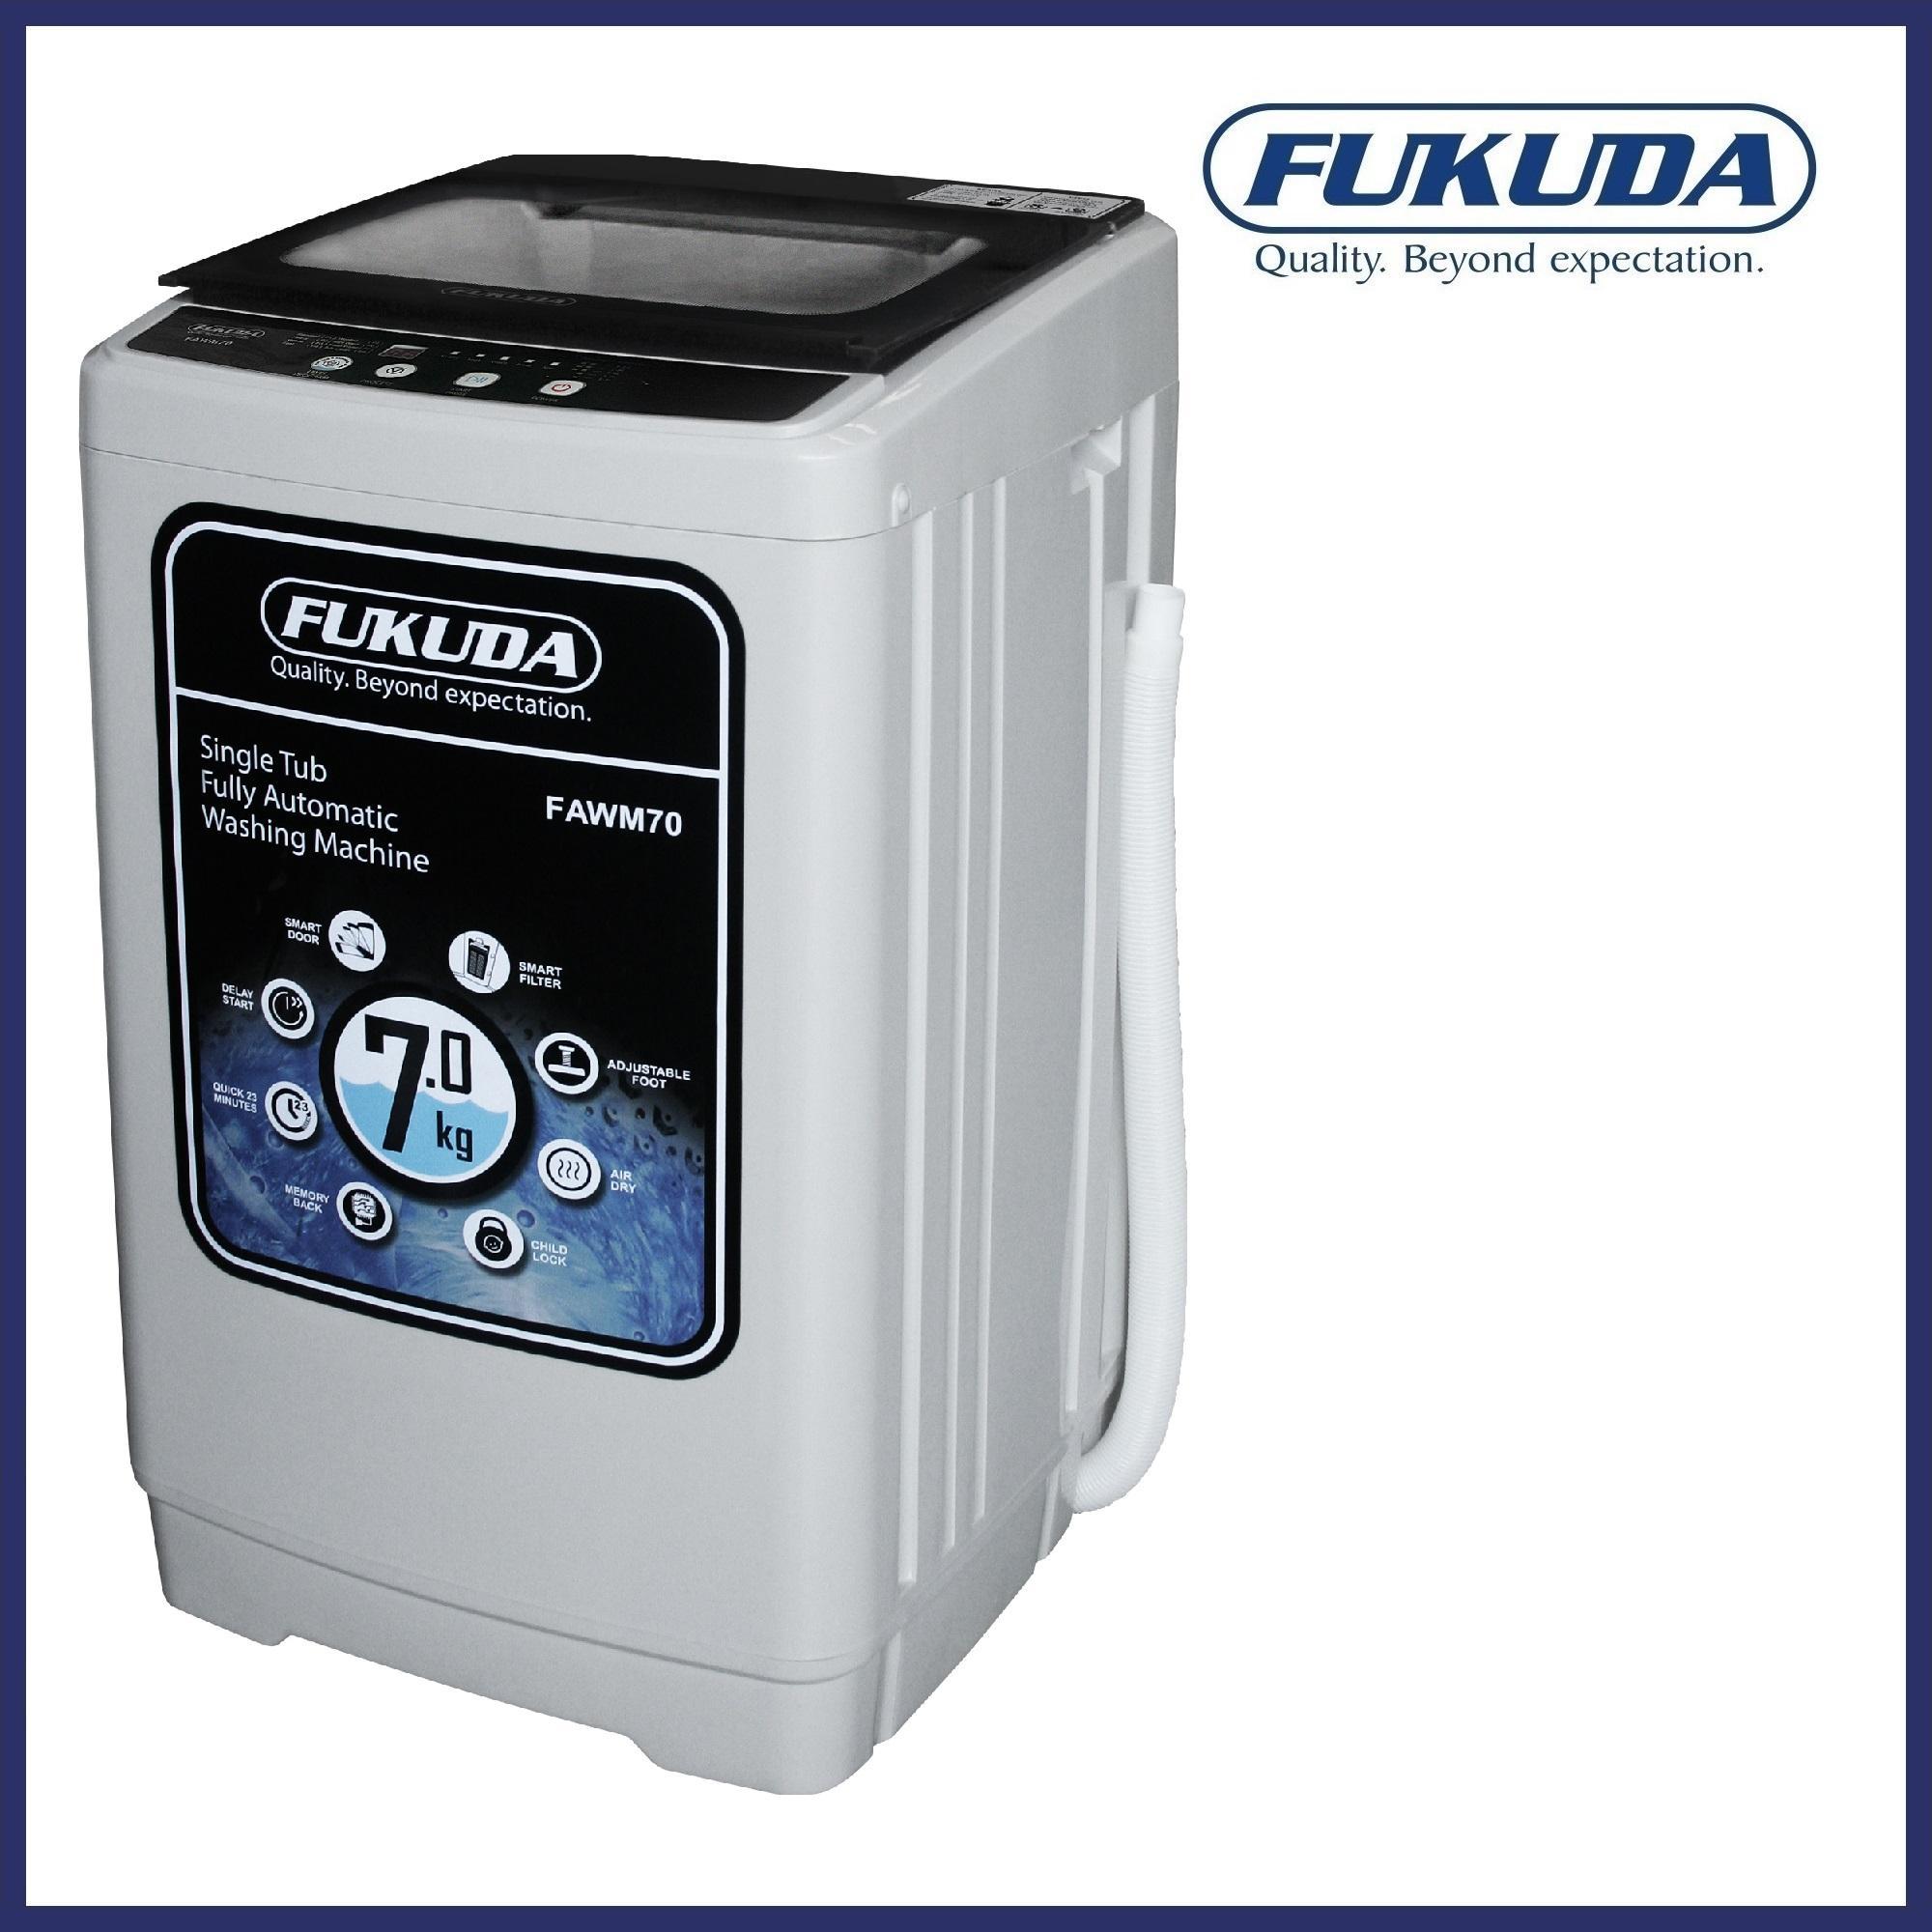 fukuda fawm70 7kg fully automatic washing machine (white)